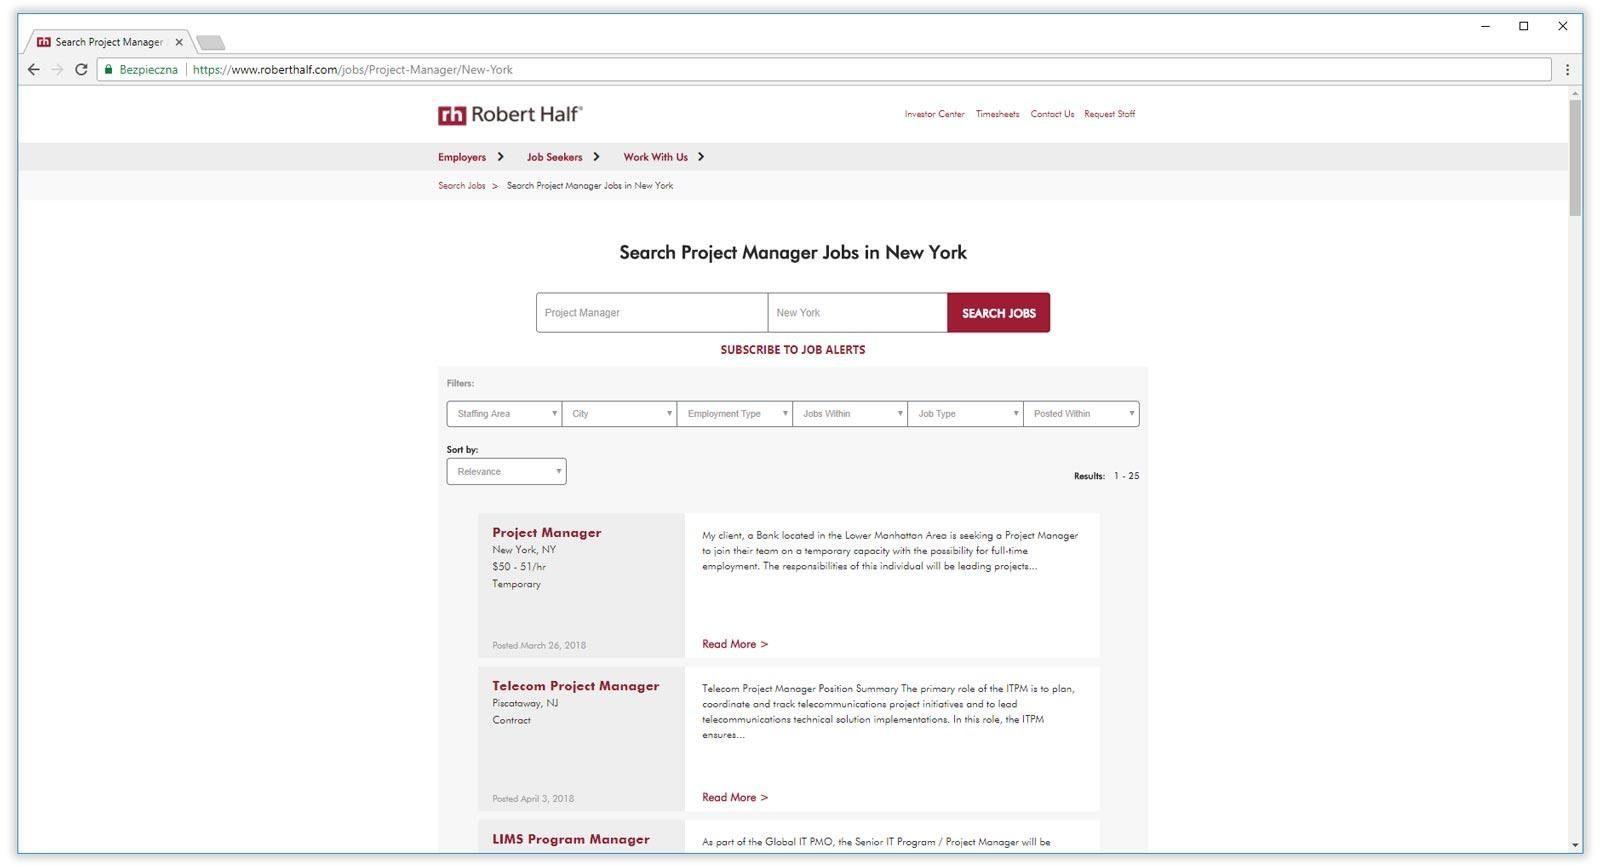 robert_half_job_search_results-9733460